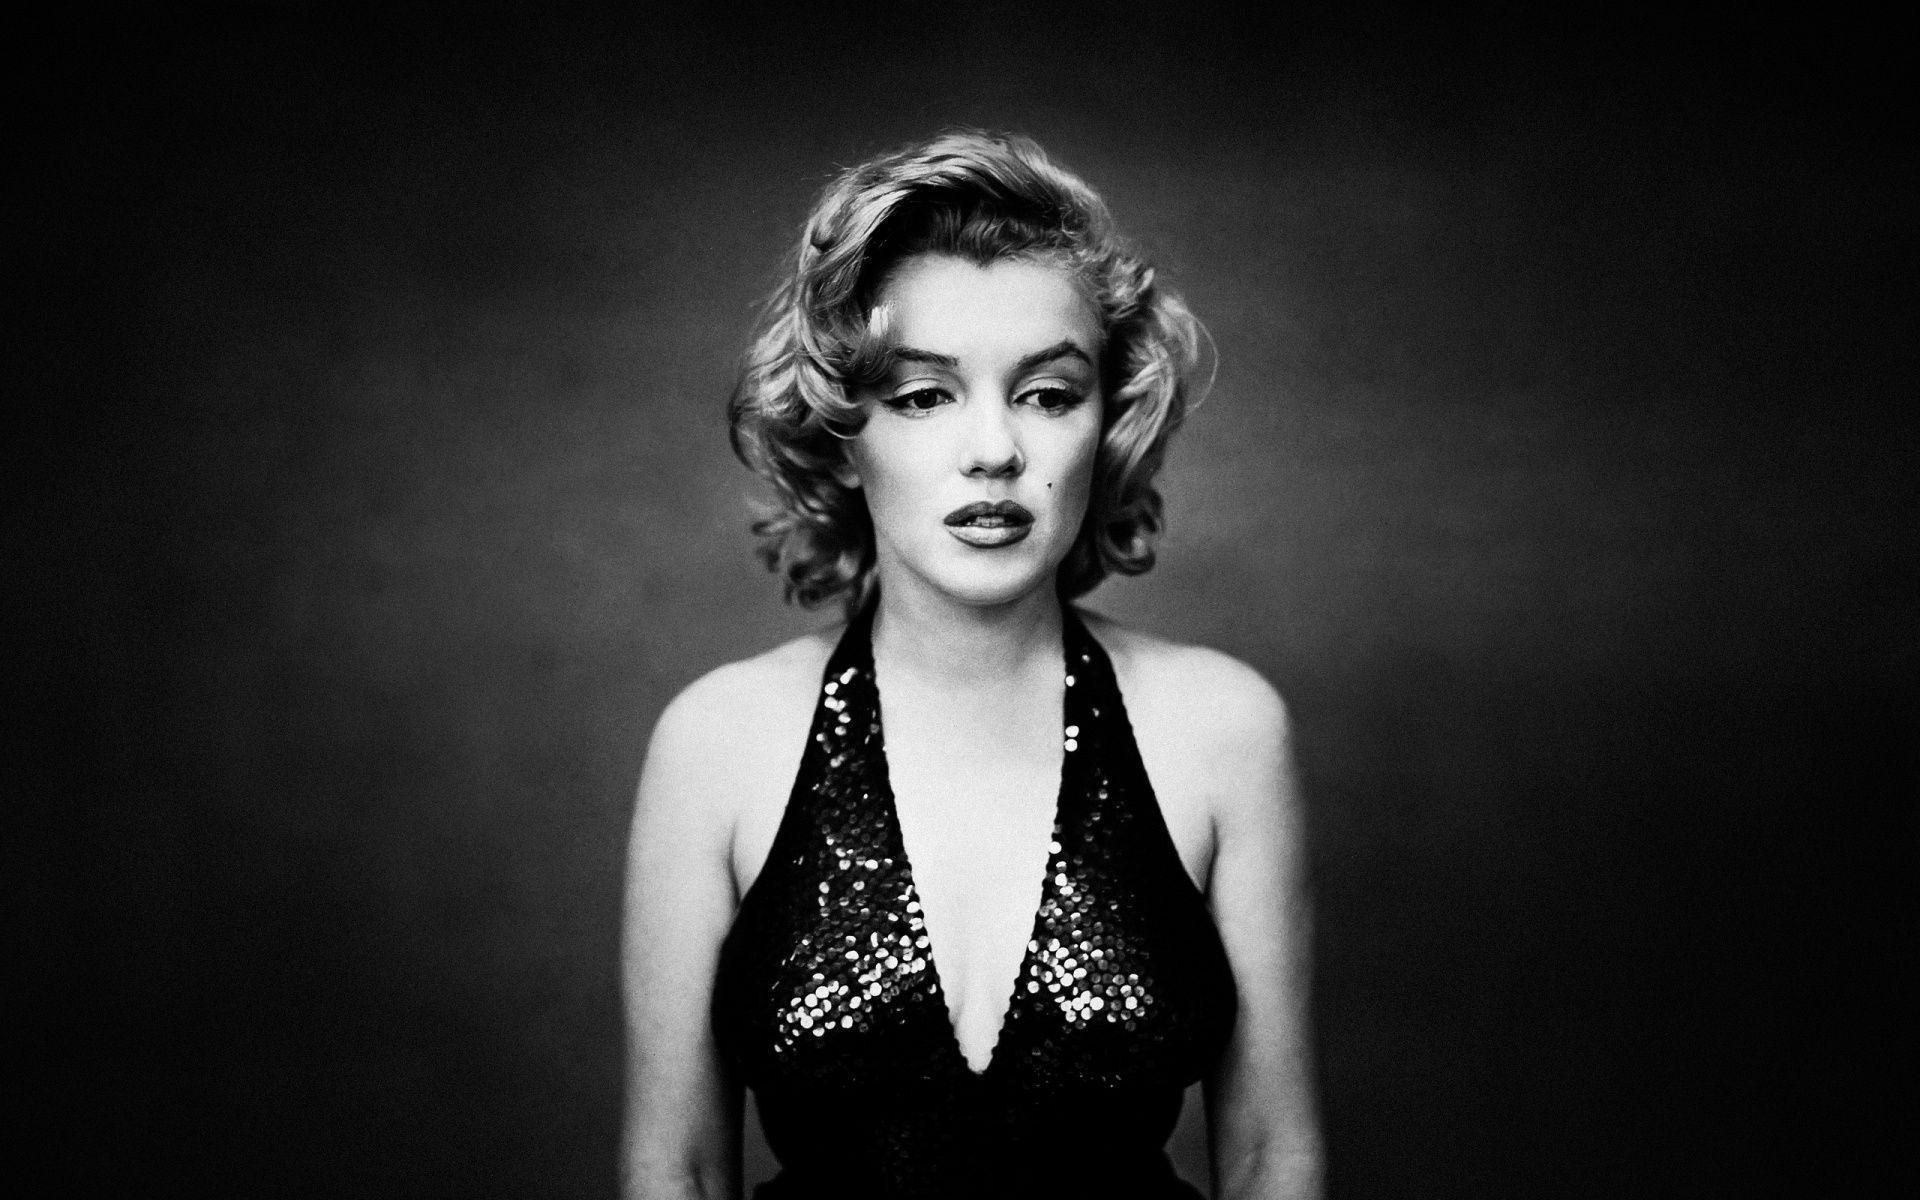 Citaten Marilyn Monroe Hd : Marilyn monroe wallpapers wallpaper cave